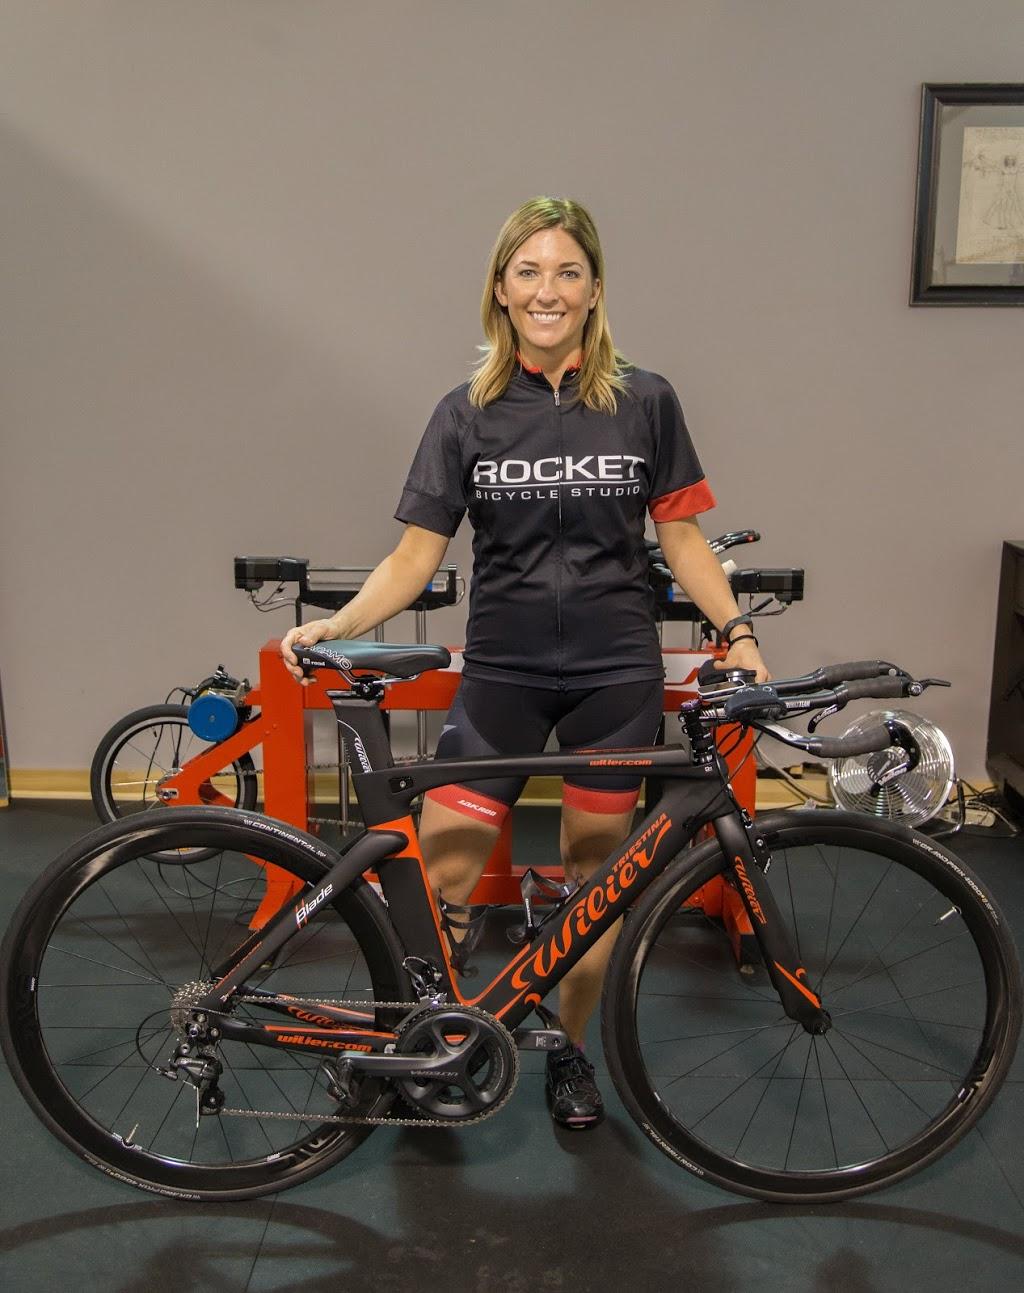 Rocket Bicycle Studio, LLC - bicycle store  | Photo 5 of 10 | Address: 507 Bruce St, Verona, WI 53593, USA | Phone: (608) 239-3837